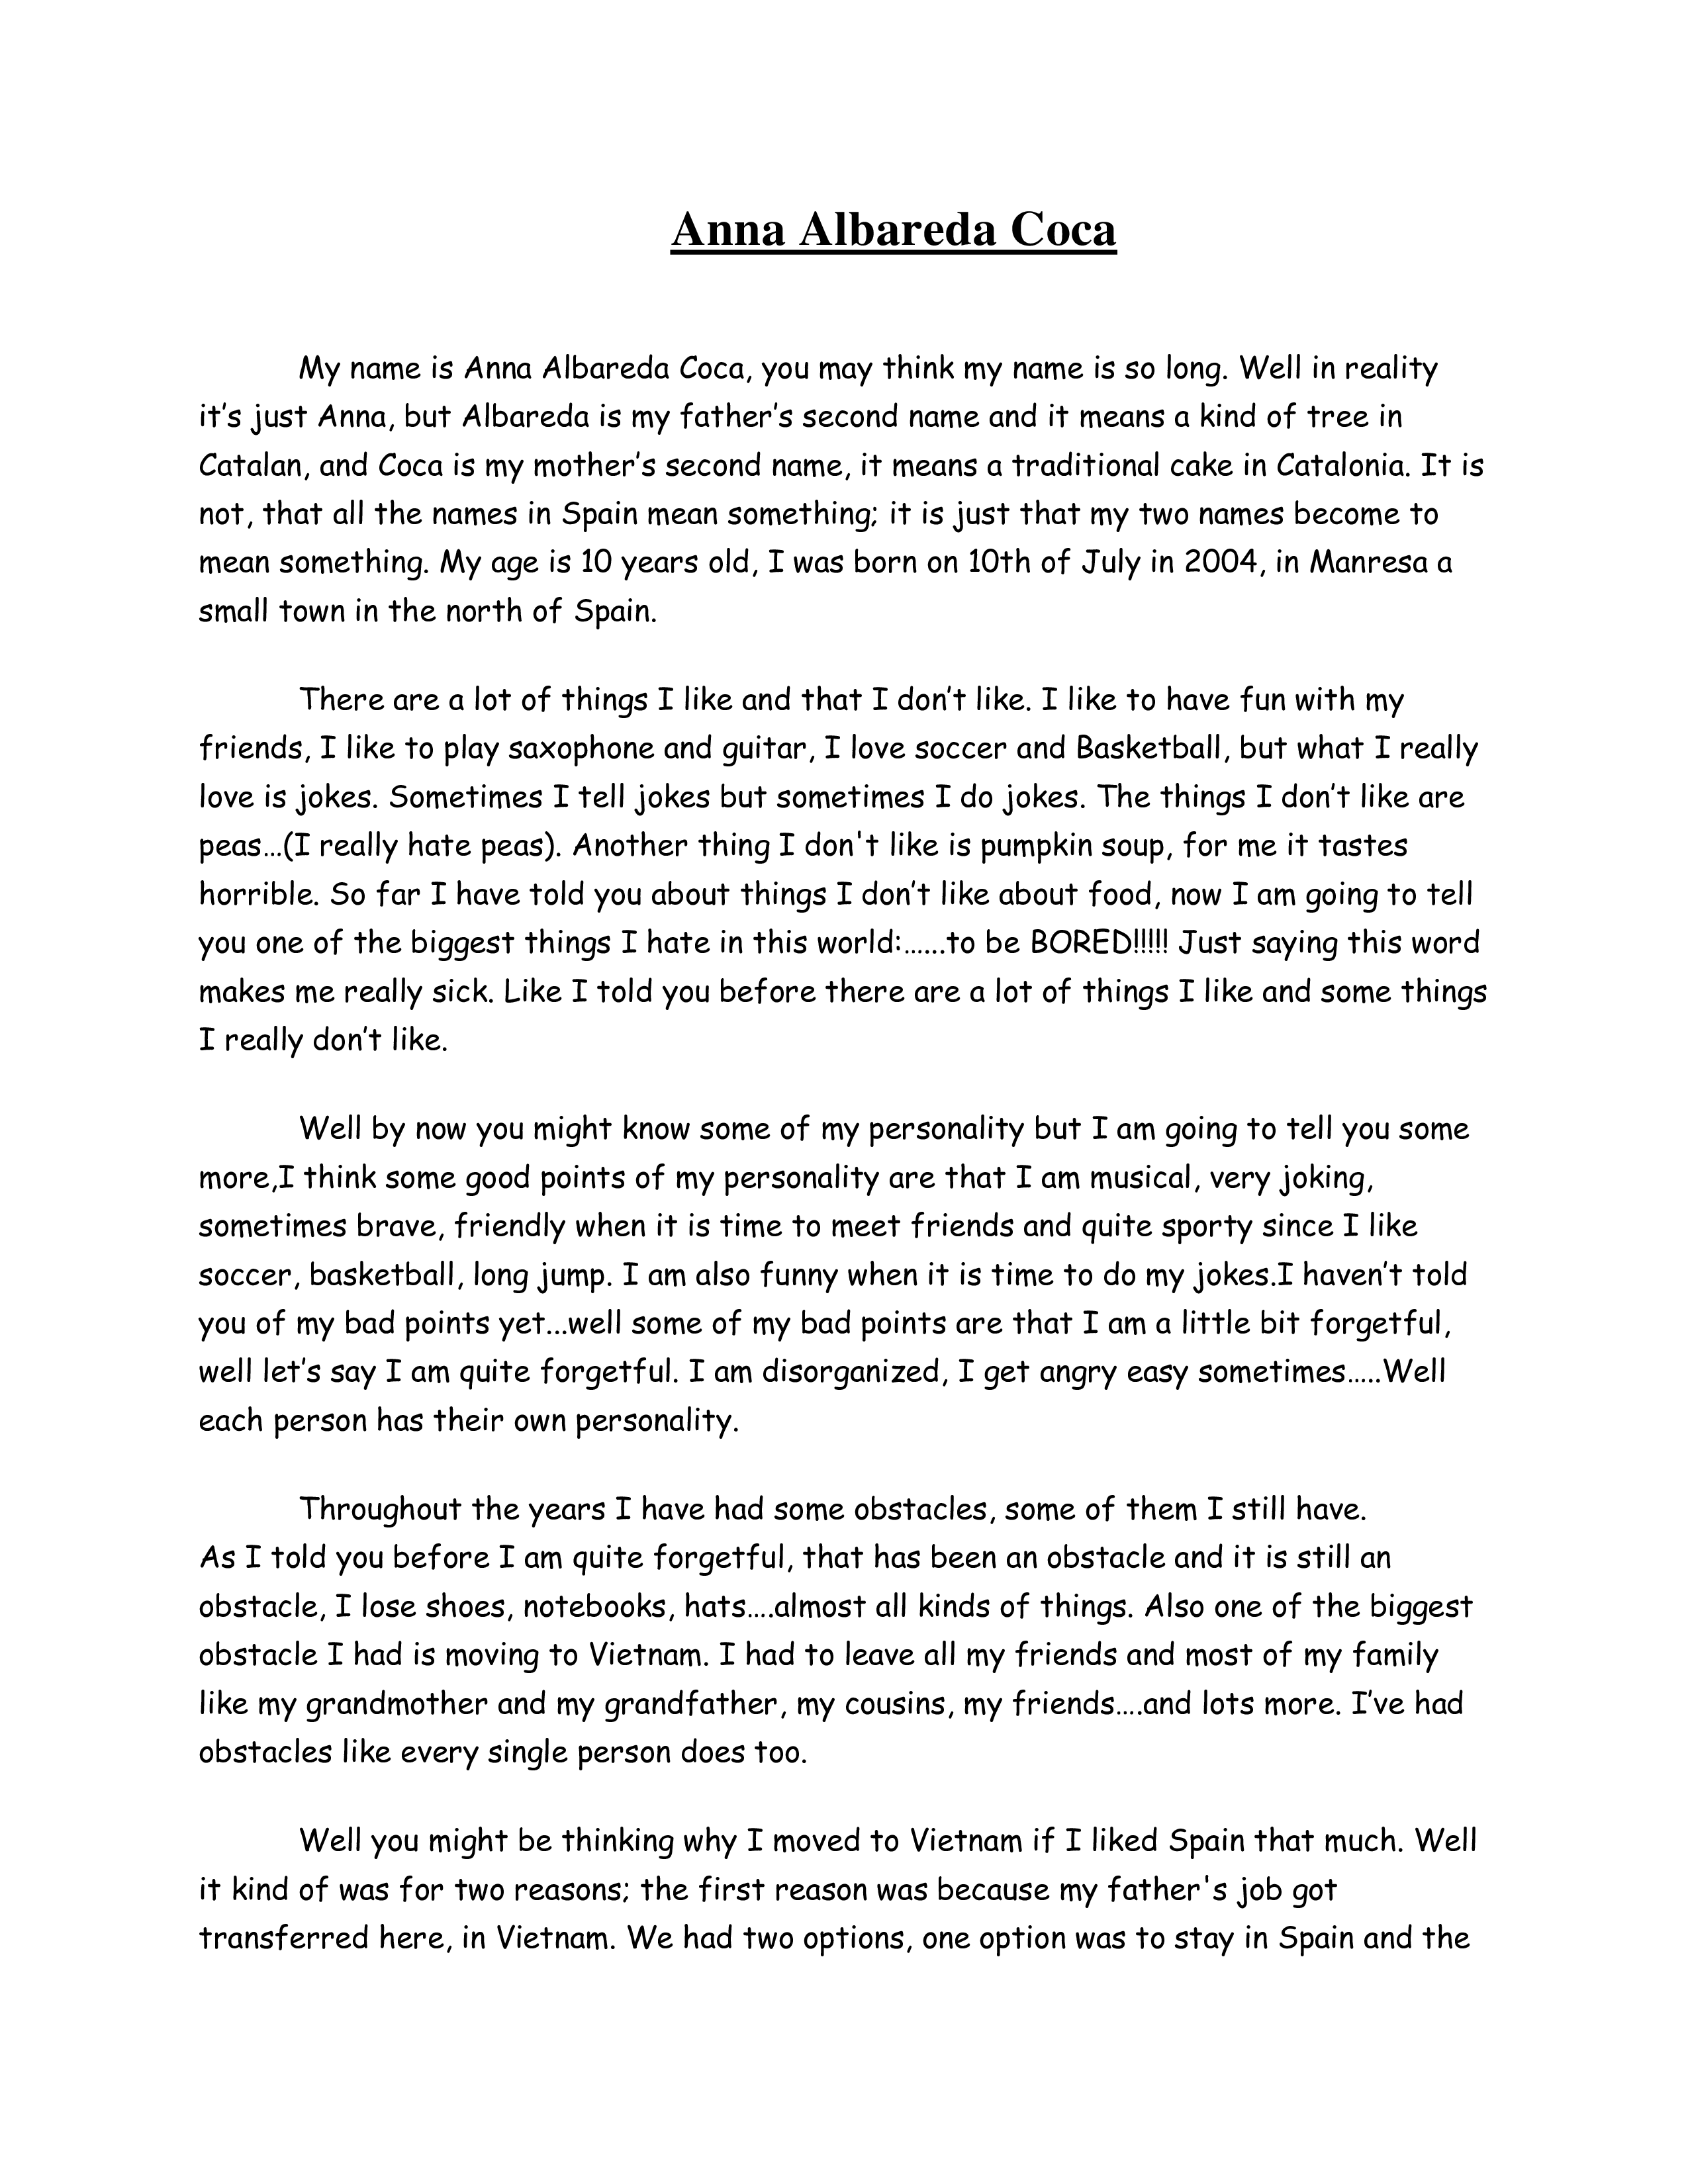 Free Funny Autobiography | Templates at allbusinesstemplates.com